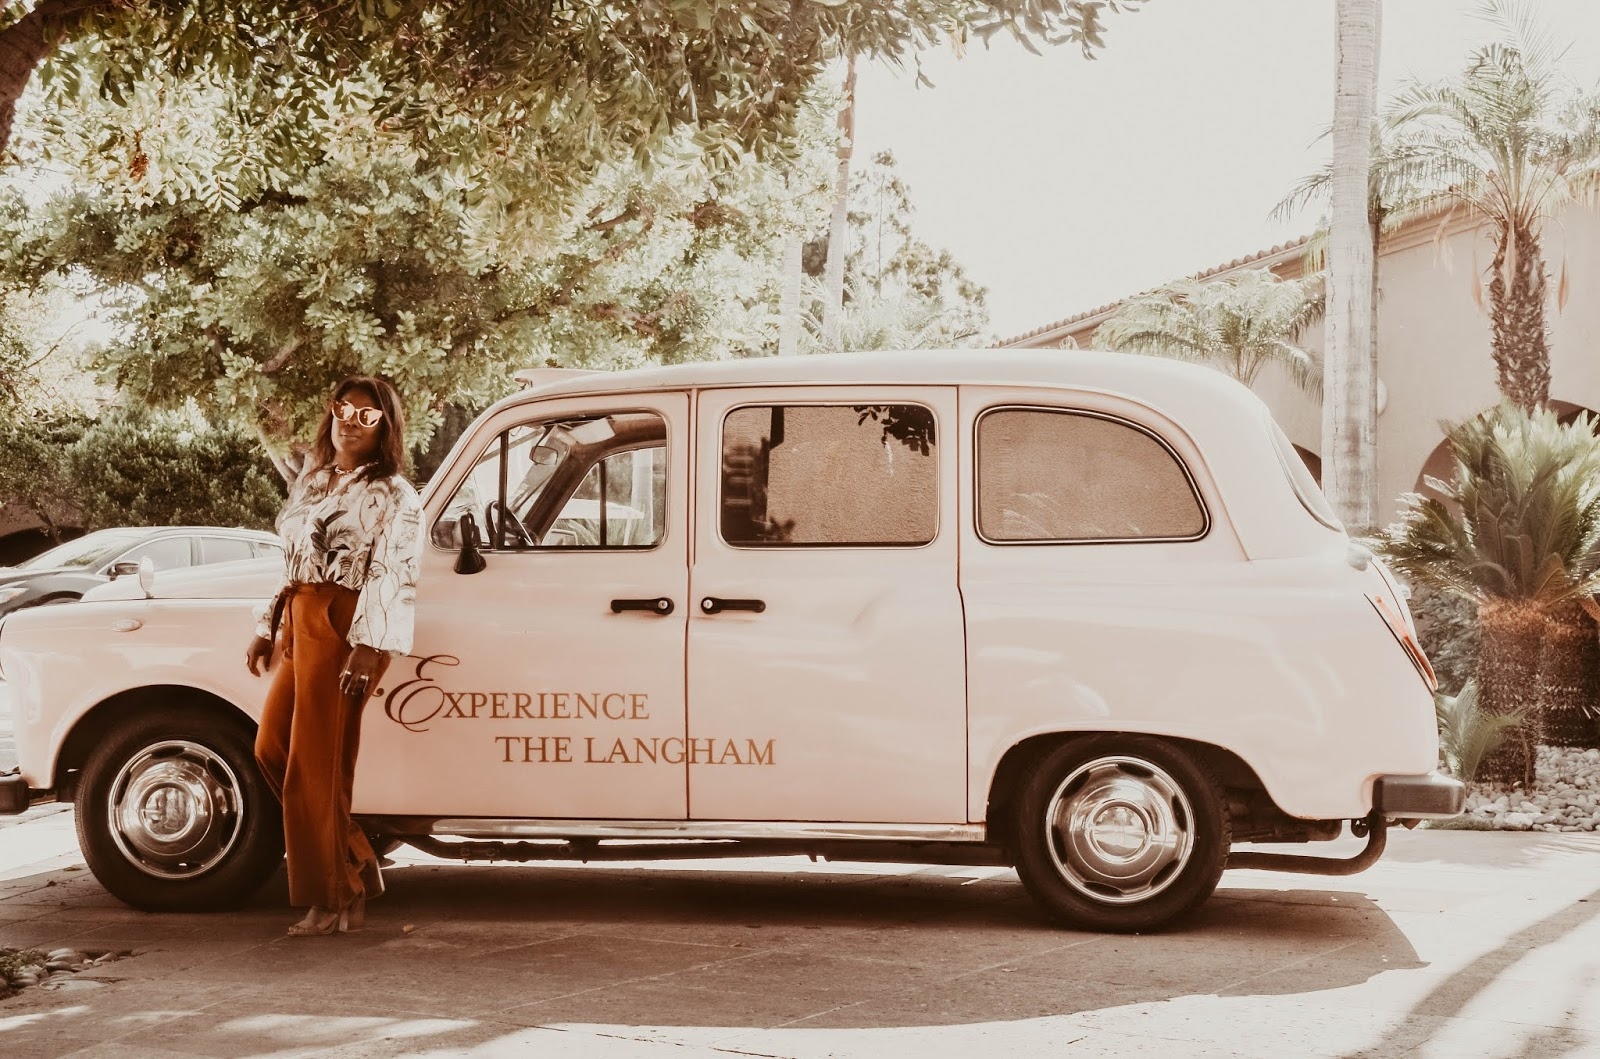 petite-women-fashion-the-langham-hotel-pasadena-california-reflecting-on-2019-bye2019